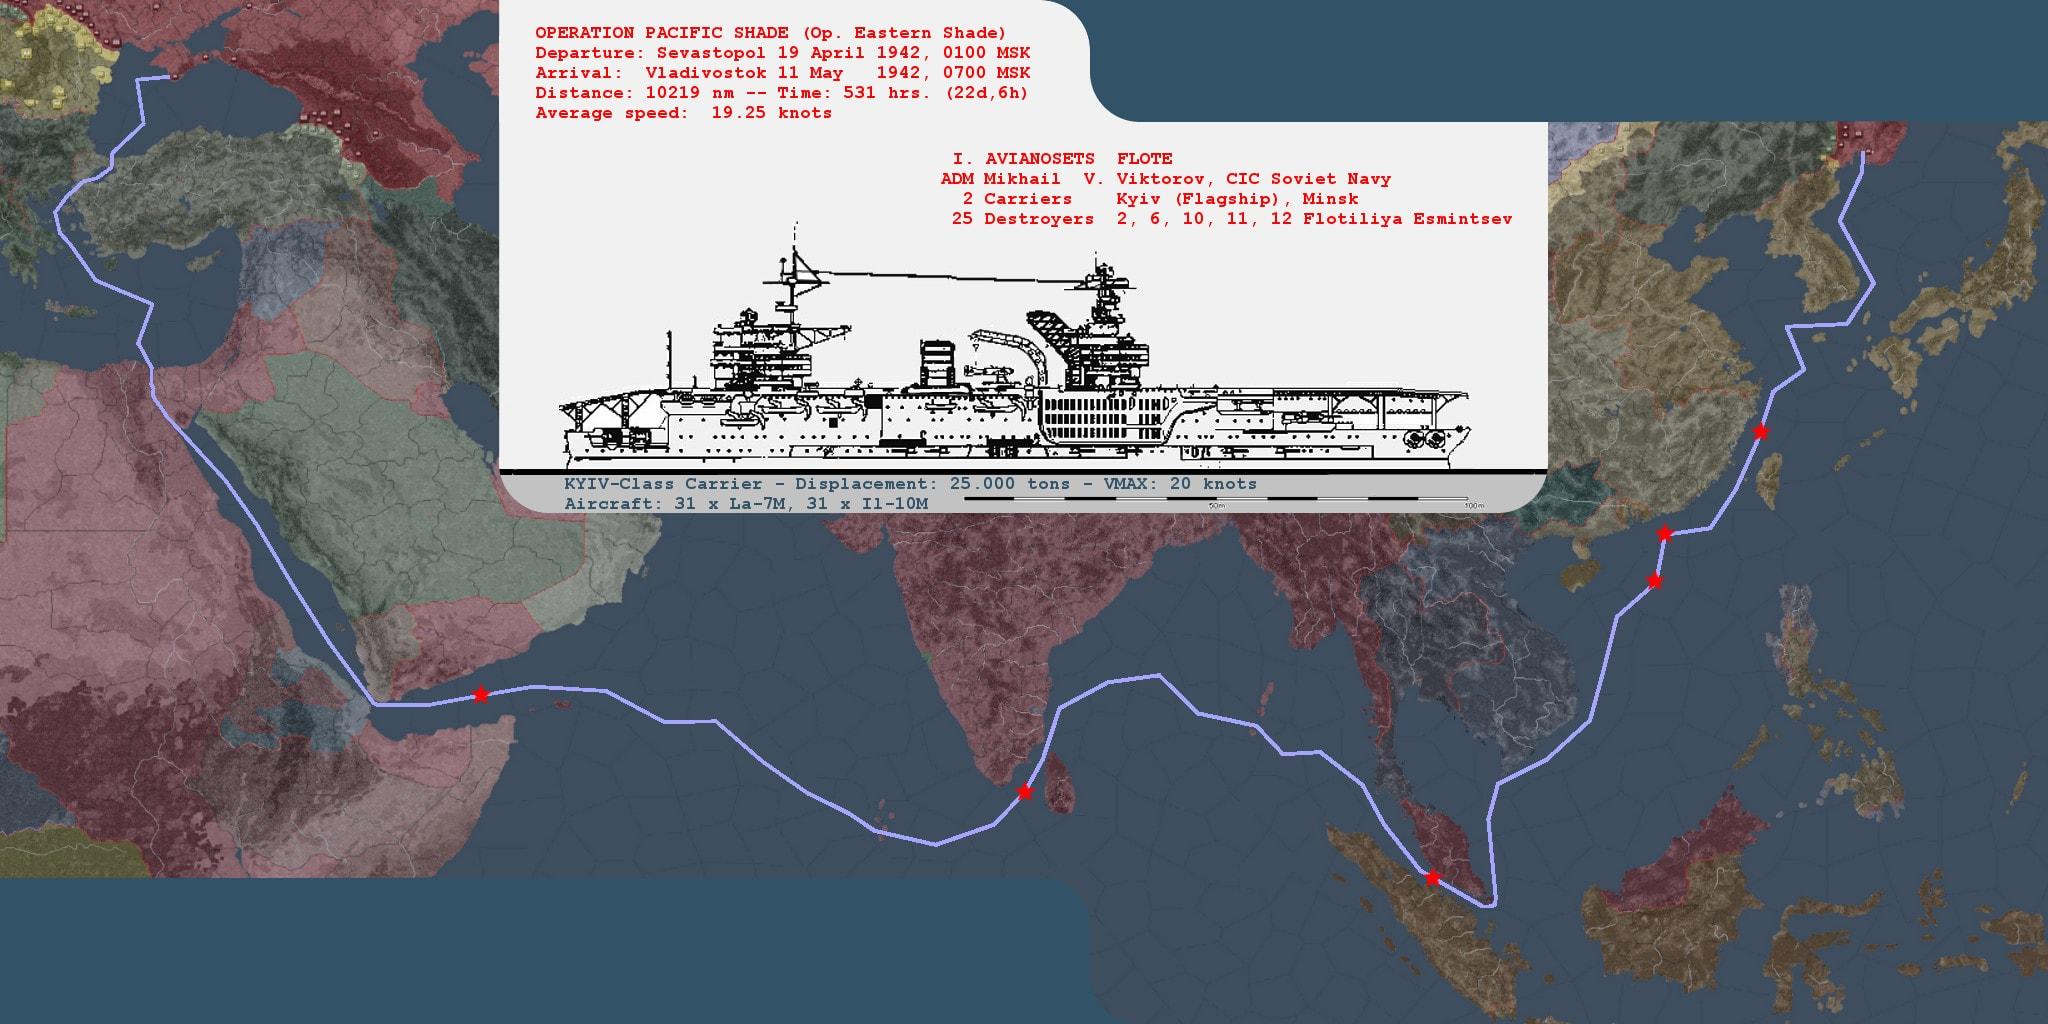 PacificShade-min.jpg